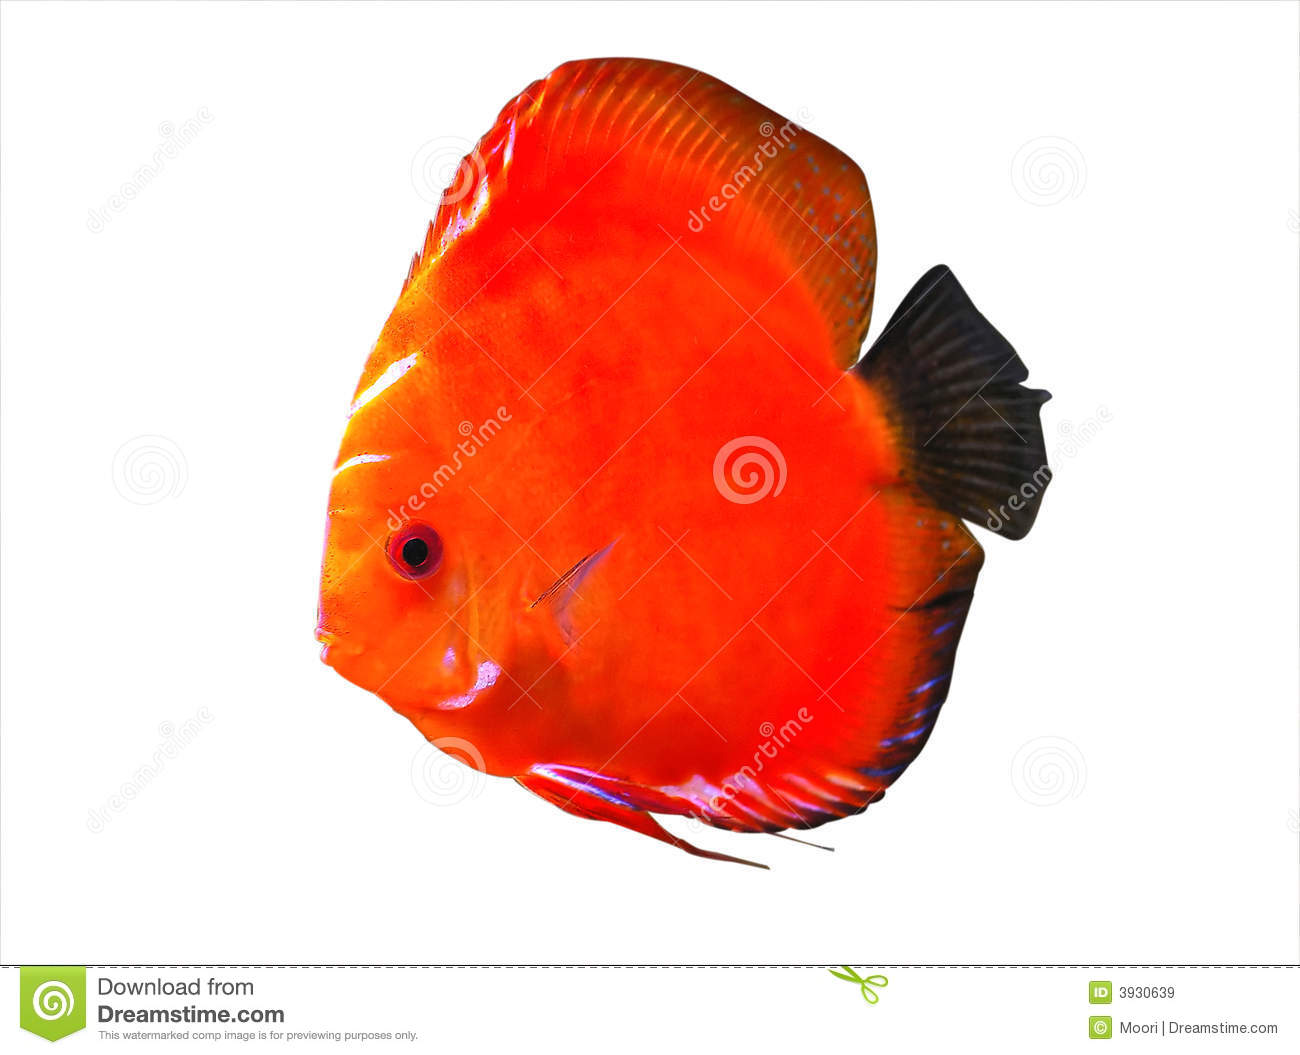 Symphysodon Discus Aquarium Fish Royalty Free Stock Images.